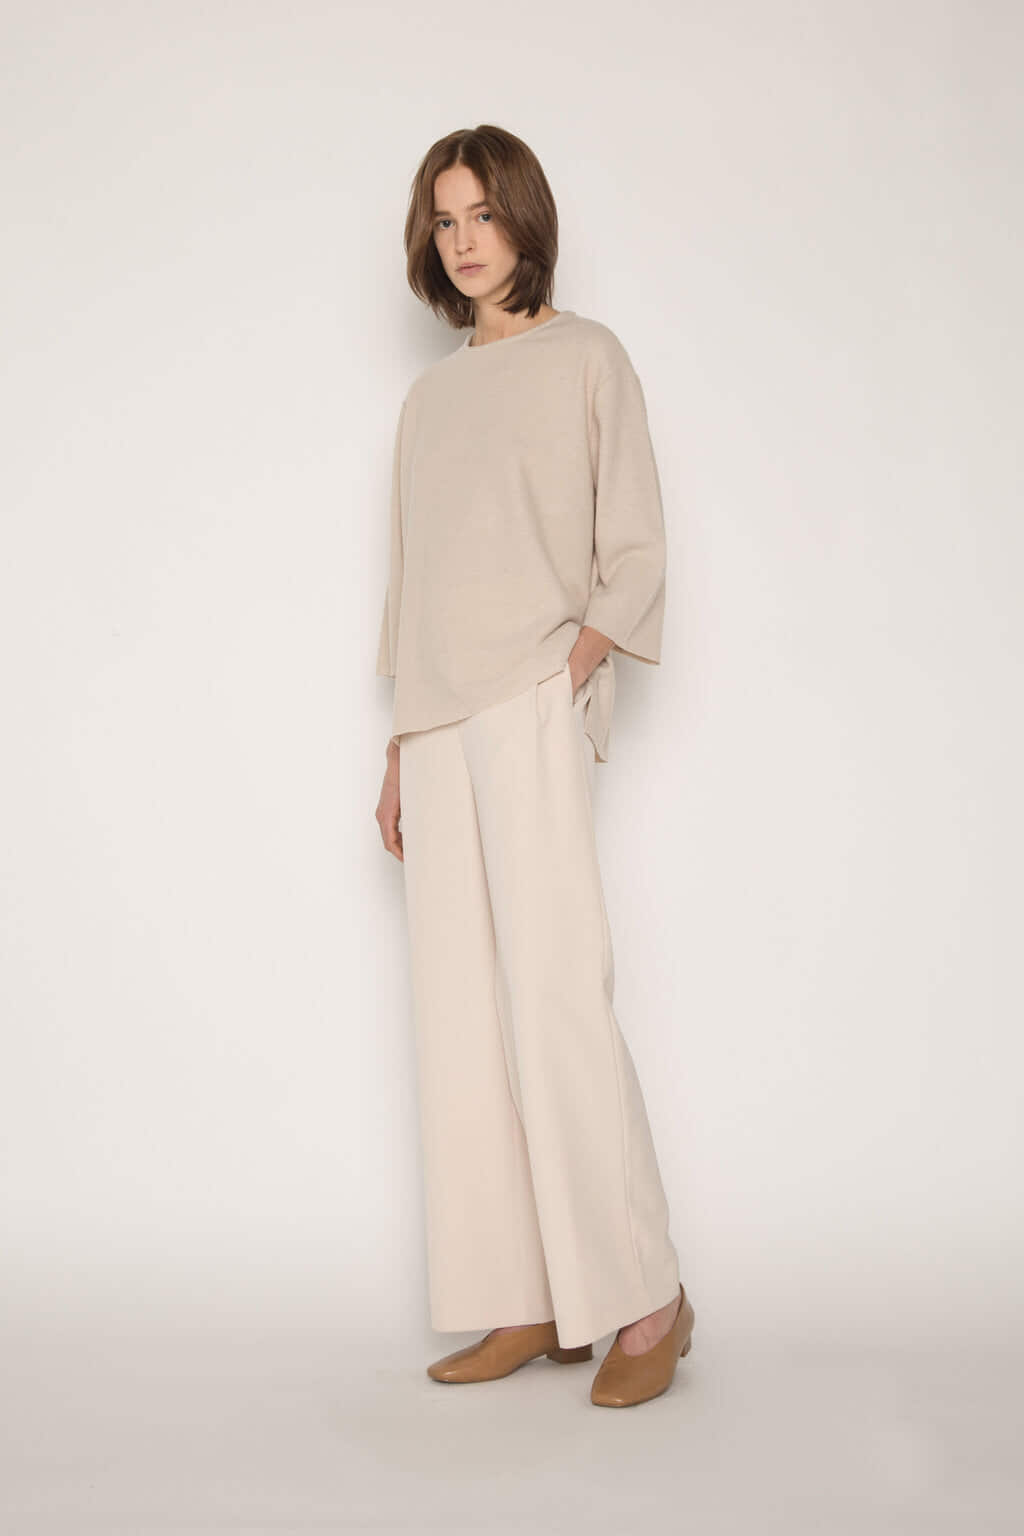 Sweater 1641 Oatmeal 3